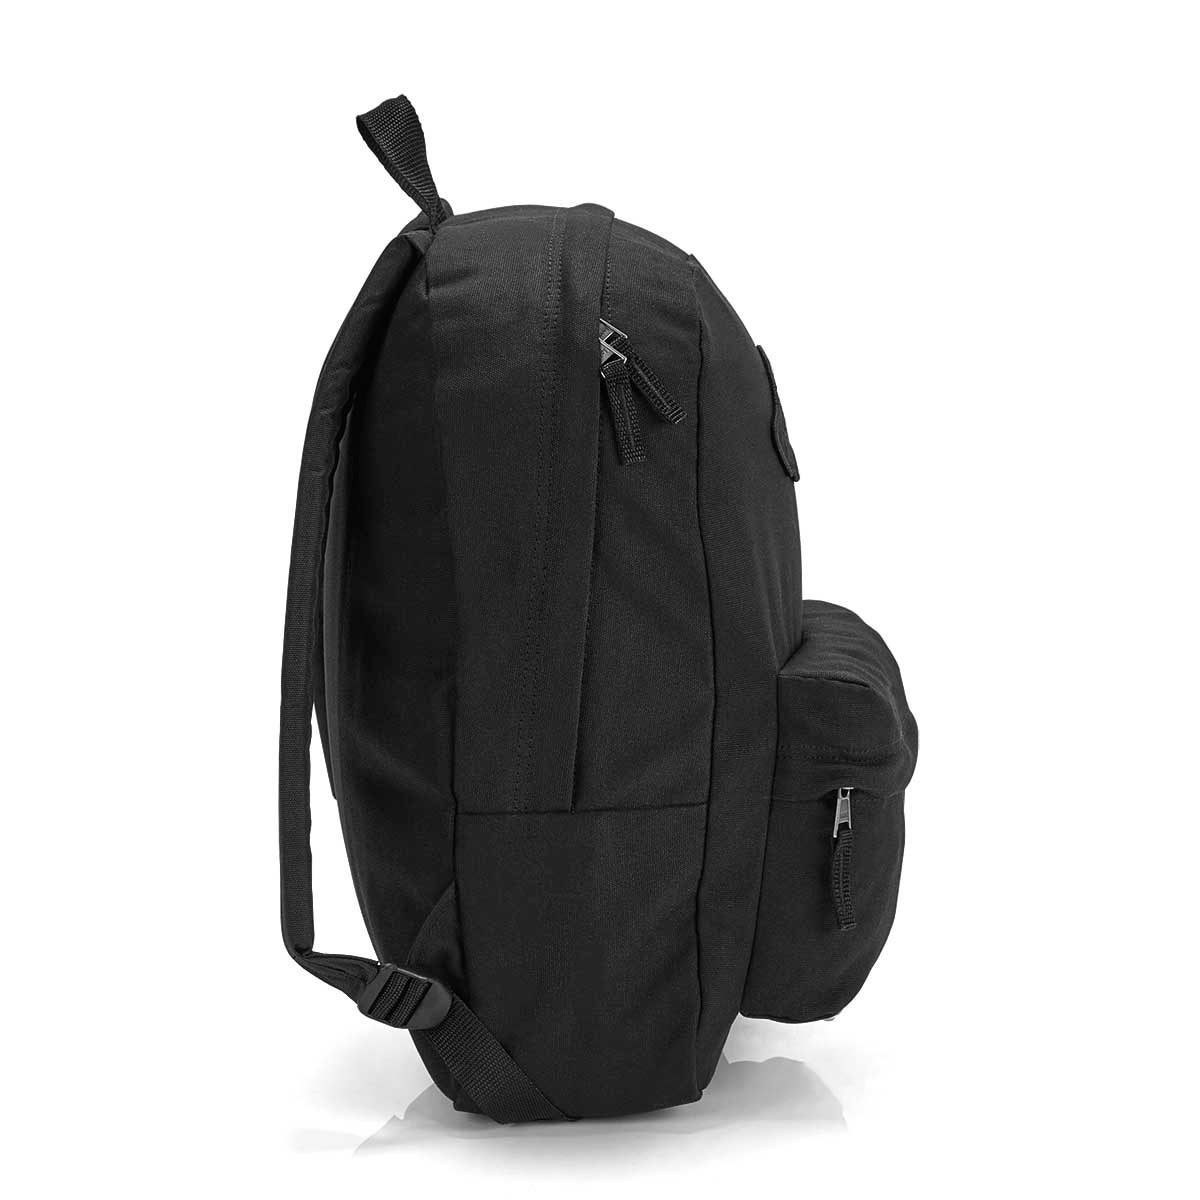 a2181beaa4 Vans Unisex REALM onyx backpack